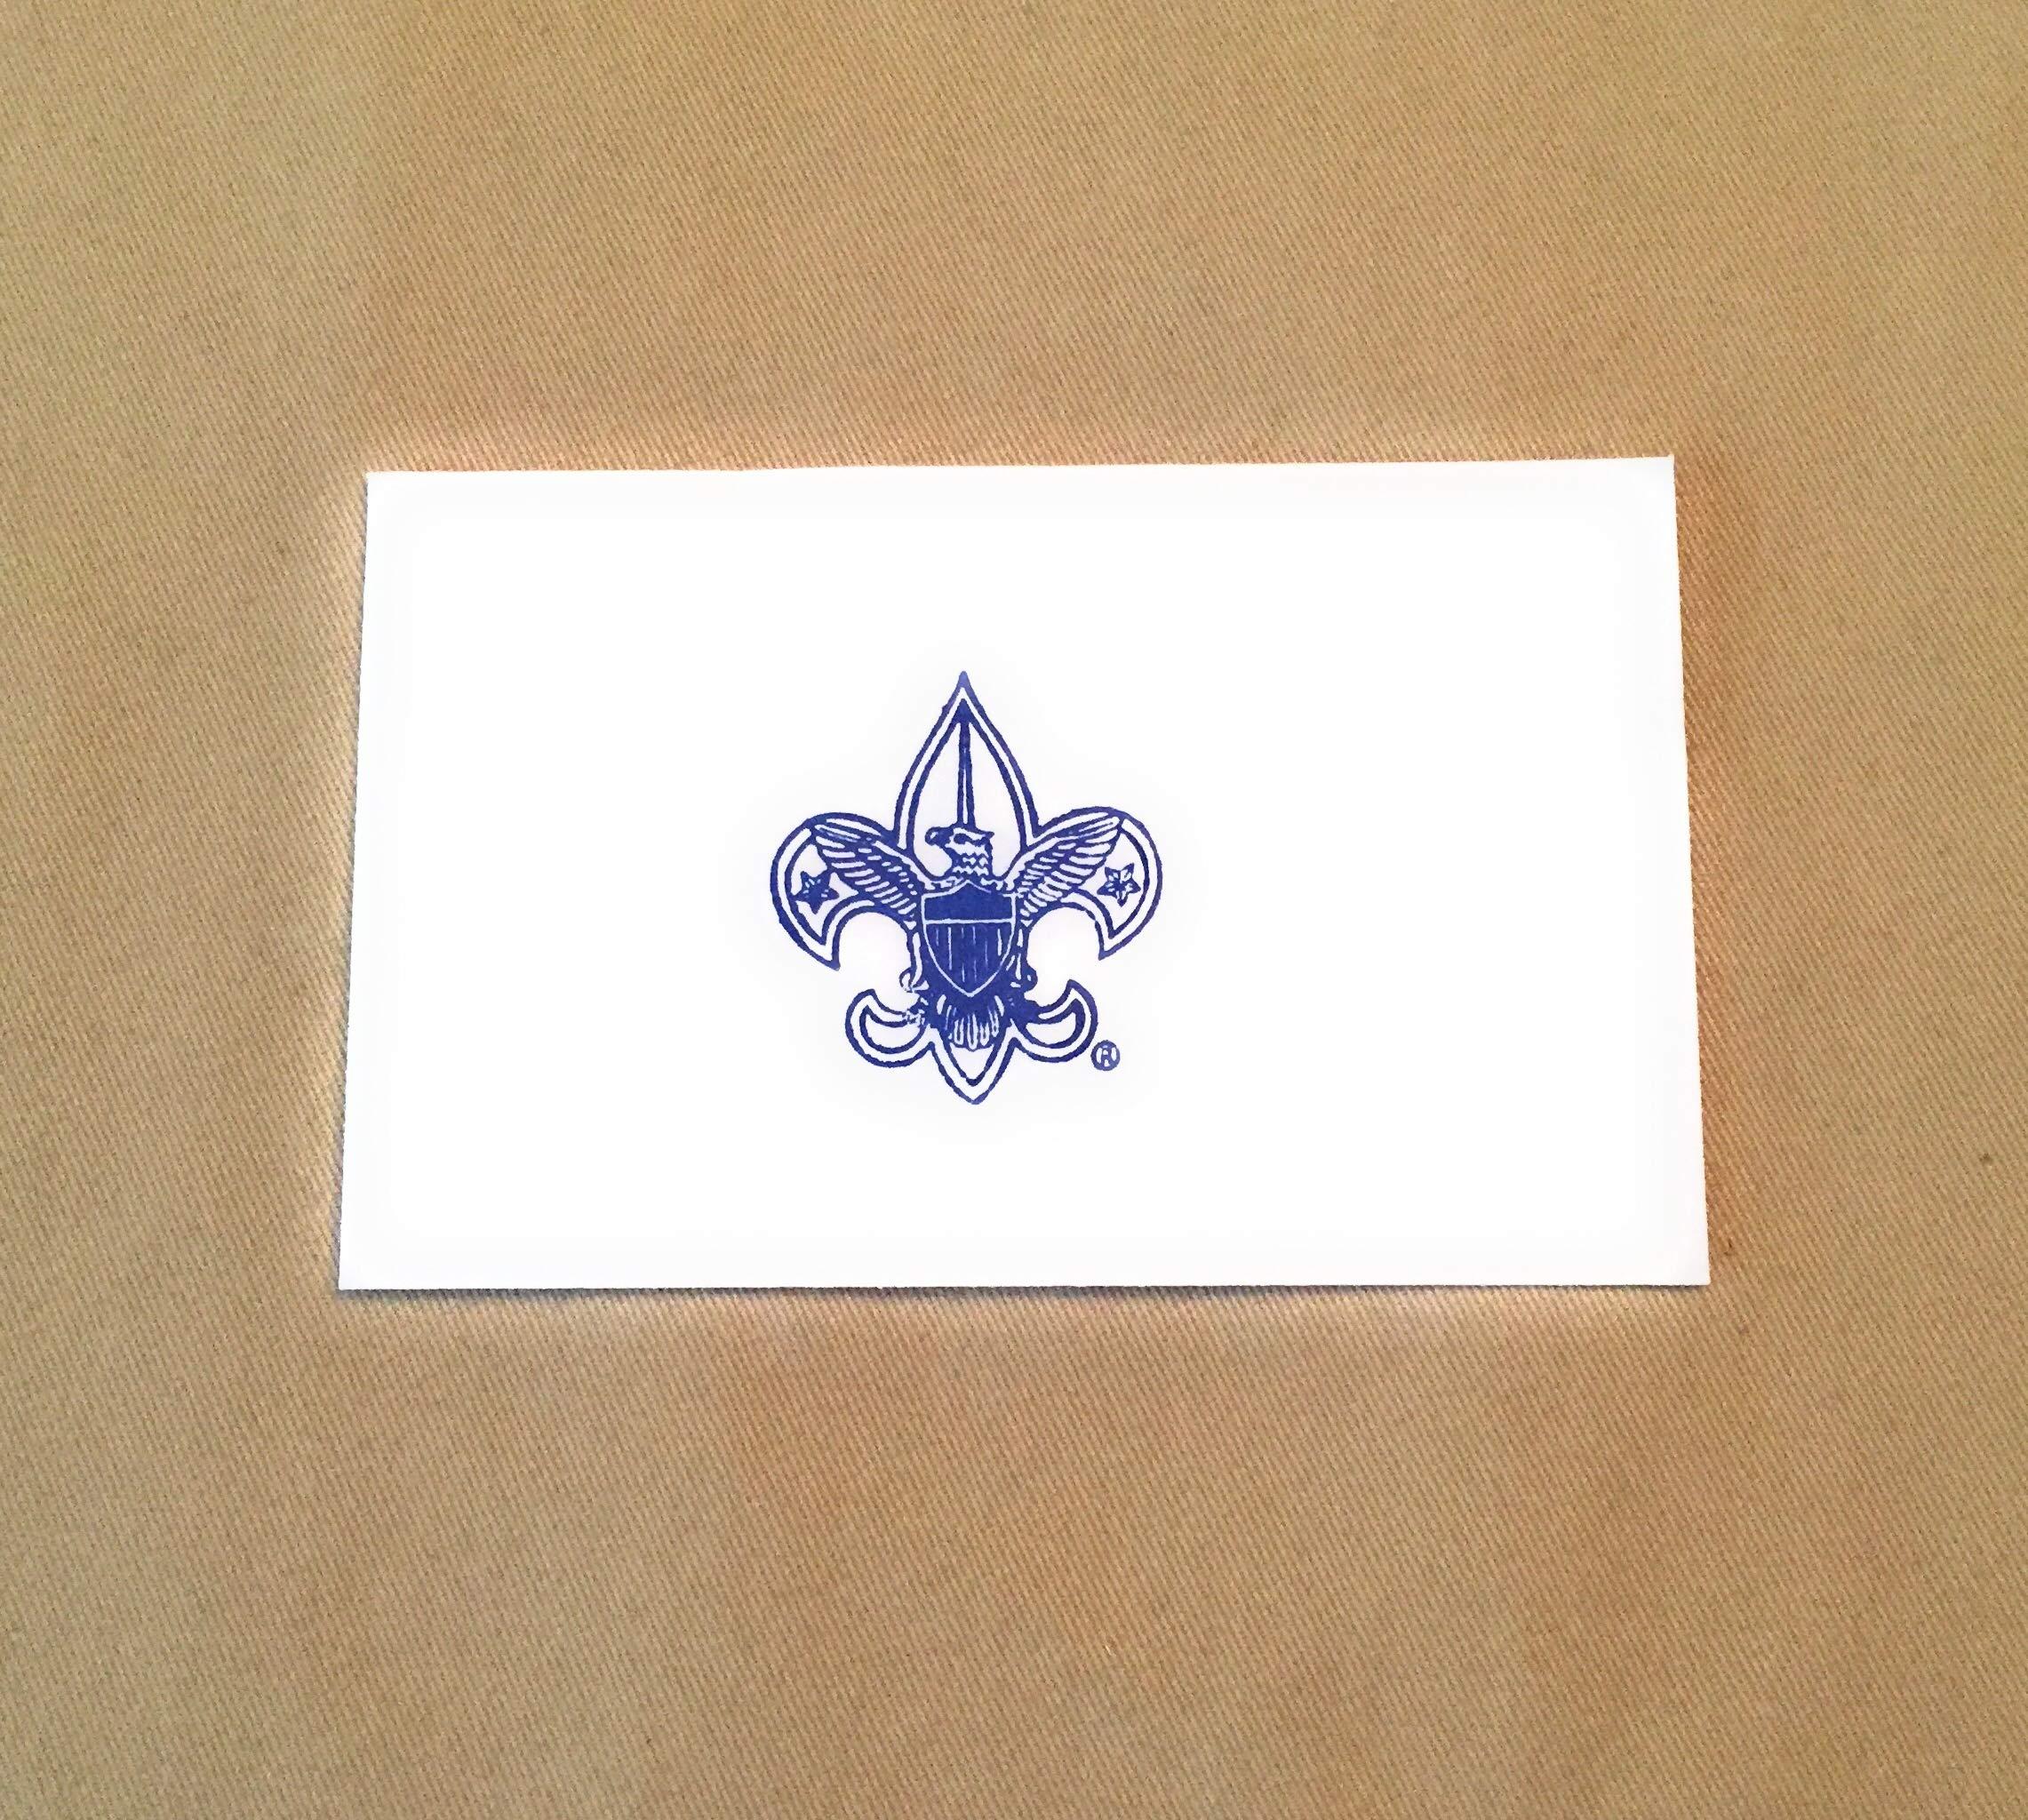 Boy Scouts of America Official BSA Uniform Cub Scout Slide Apparel (Wolf) by Boy Scouts of America